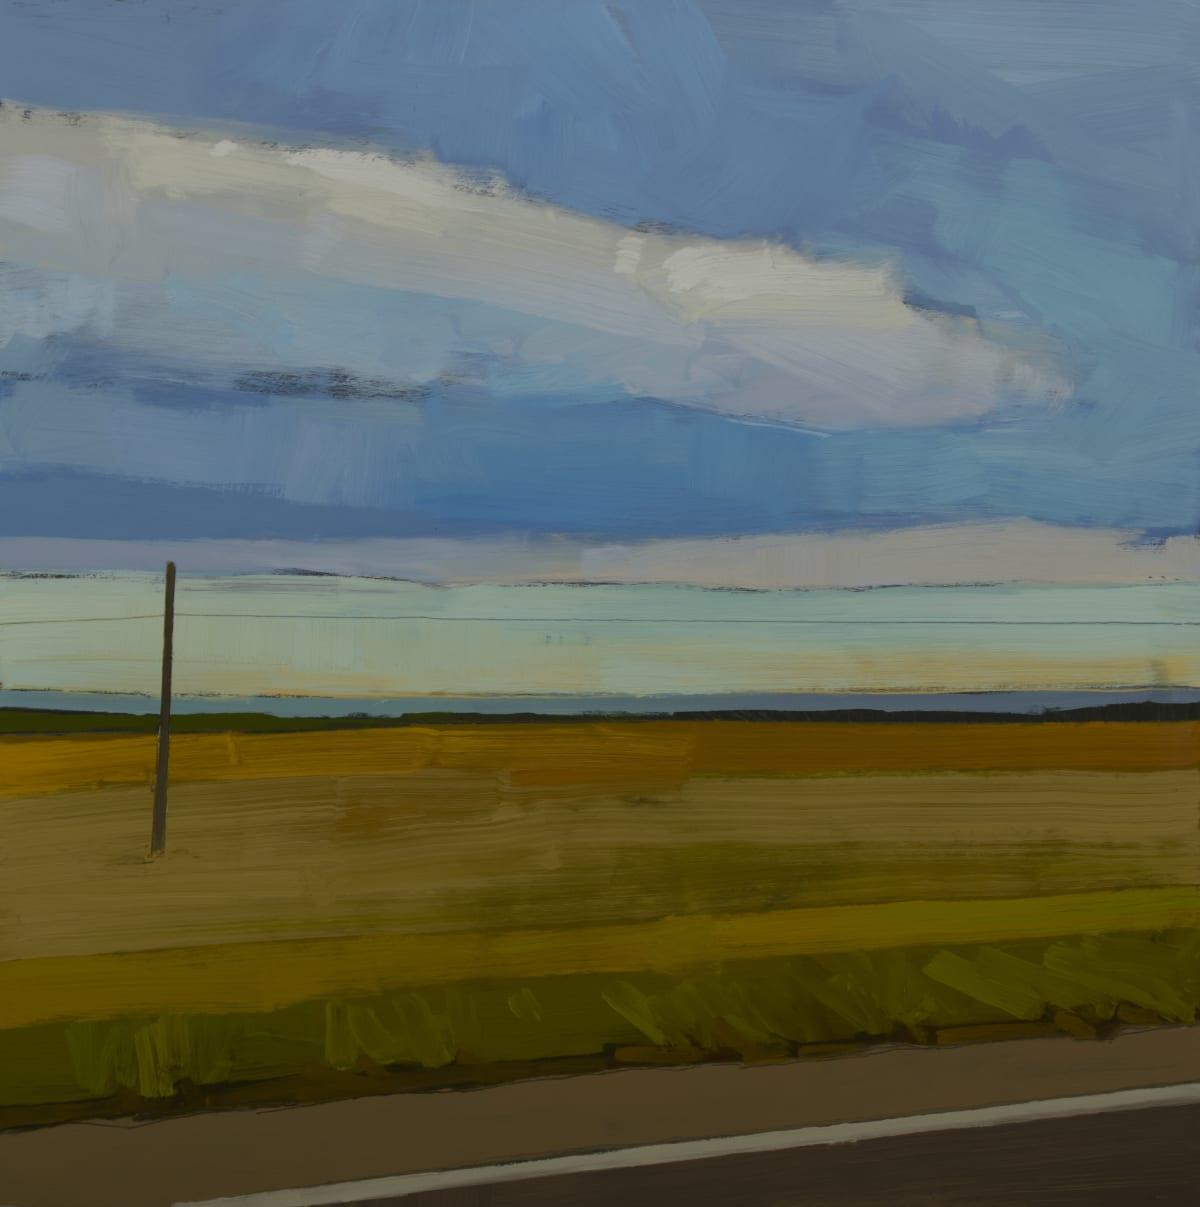 Drew Klassen, View from a highway, Spain